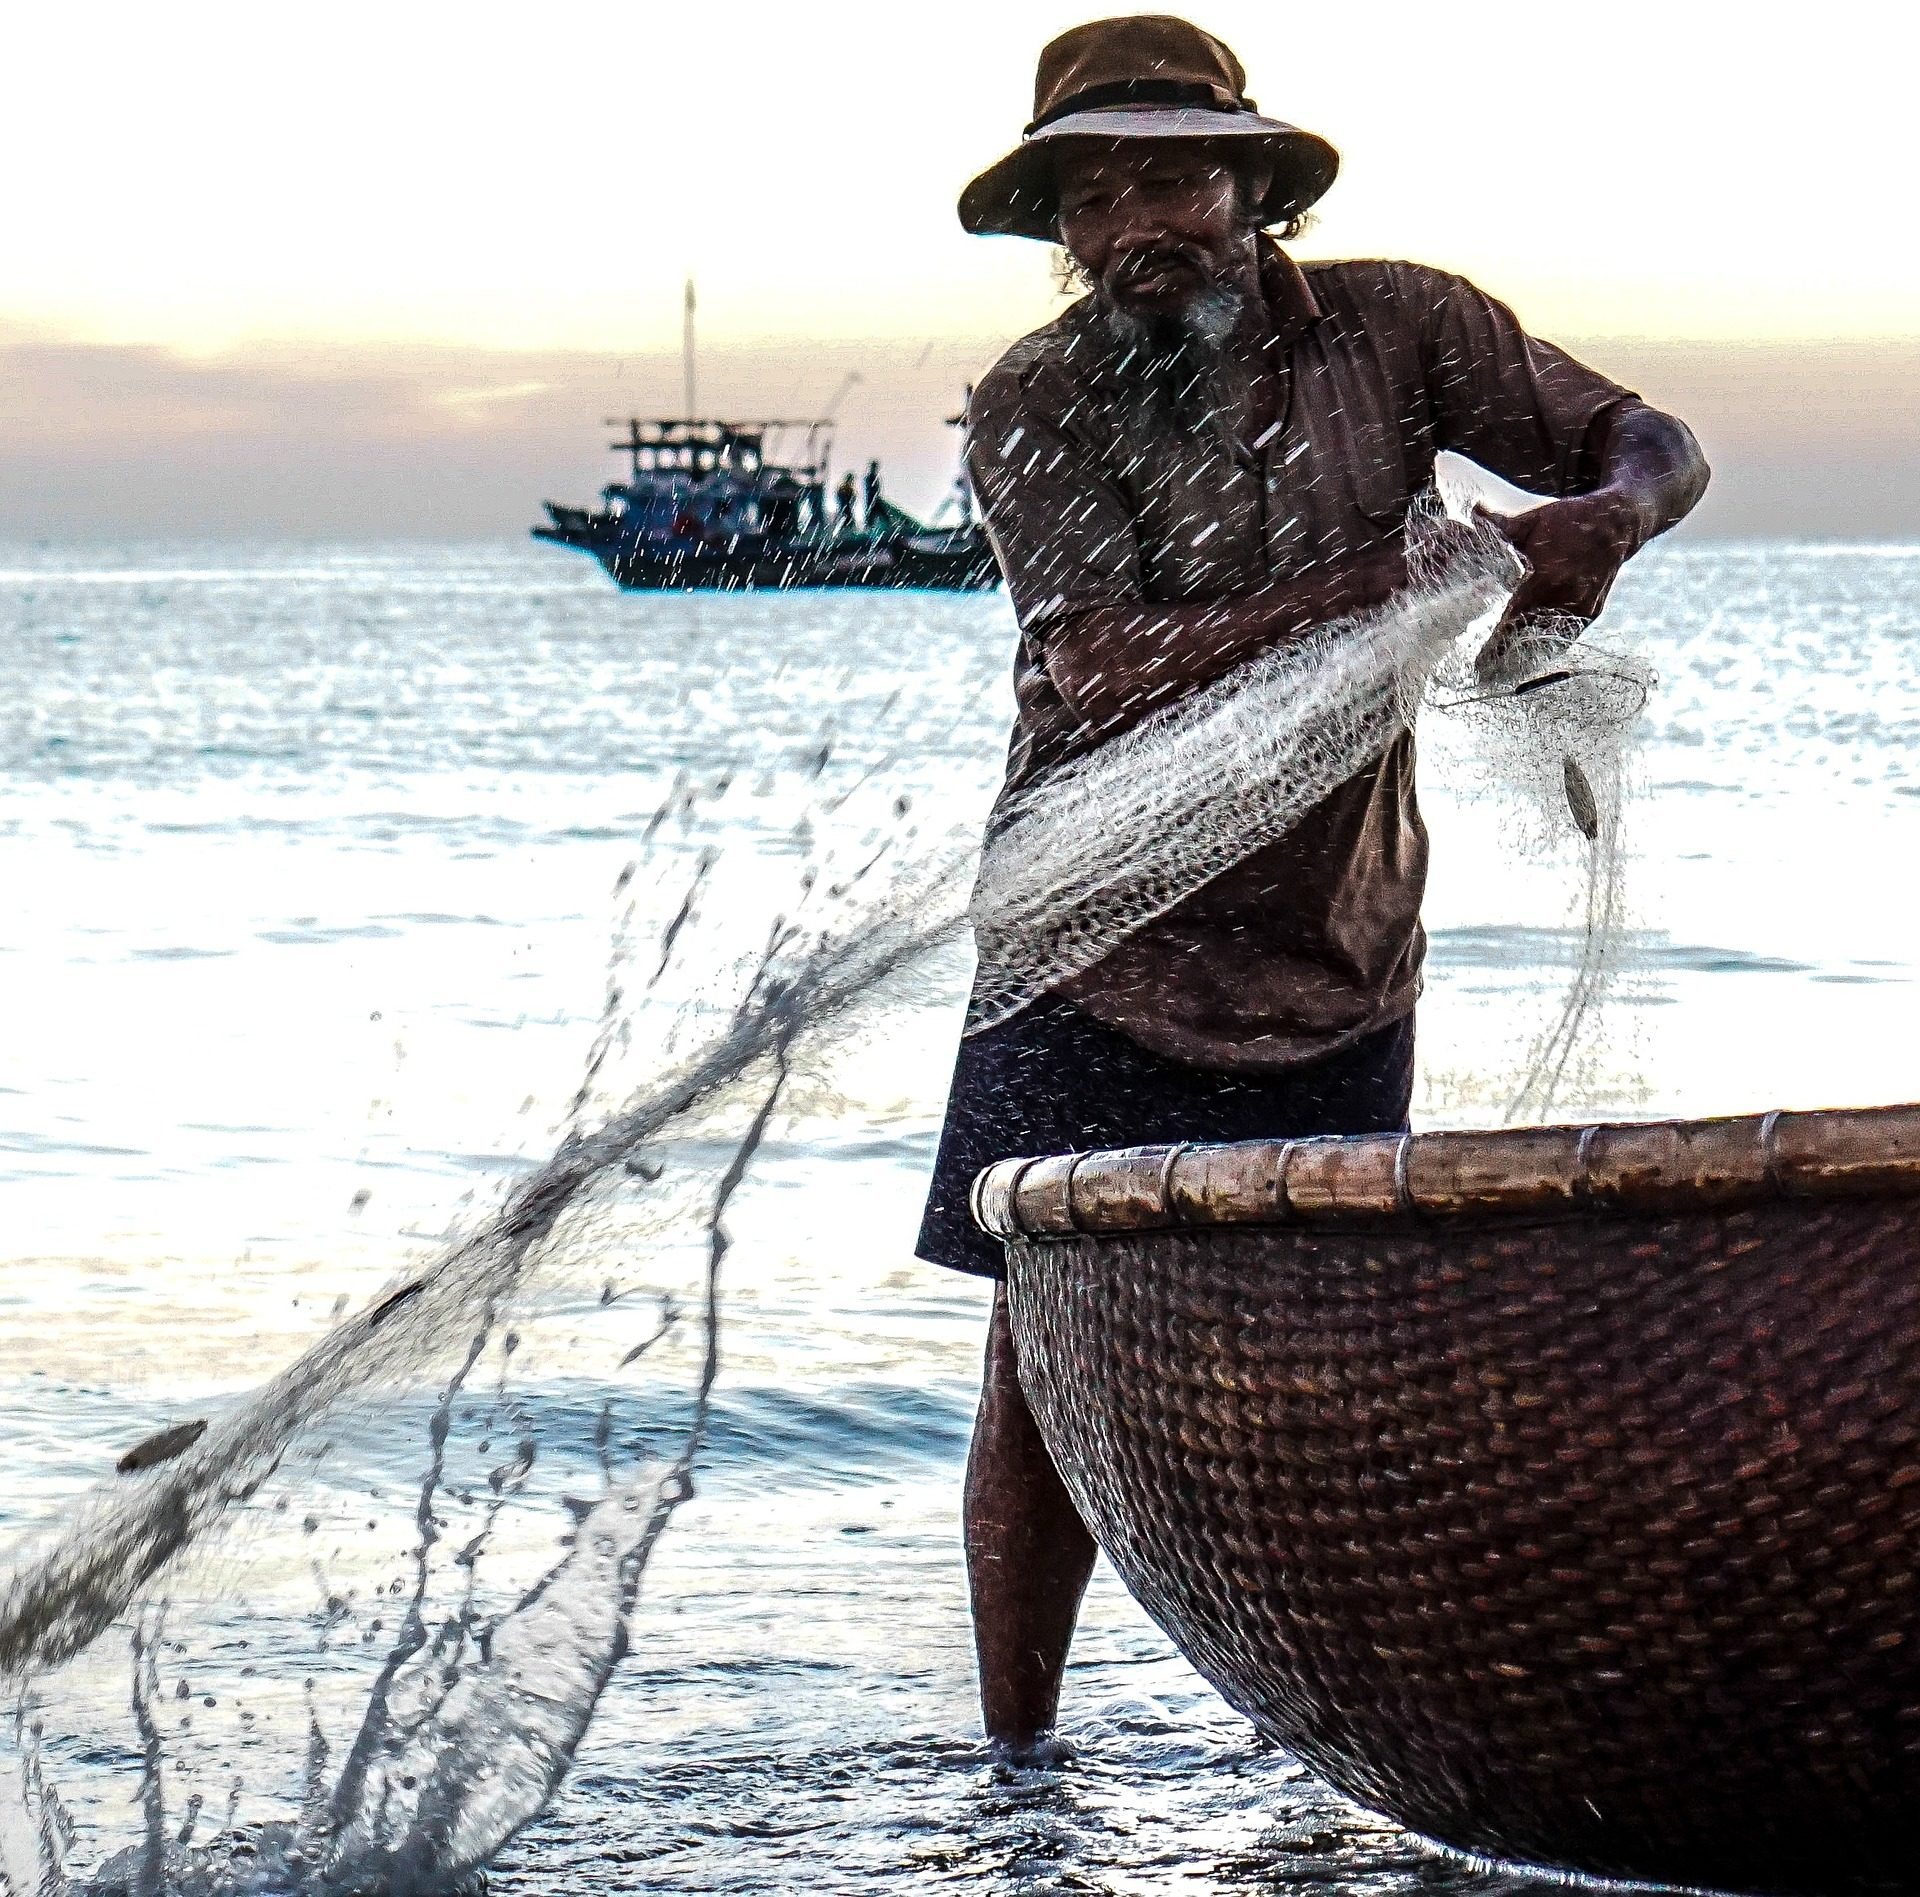 pescador, red, mar, océano, barco, malla - Fondos de Pantalla HD - professor-falken.com